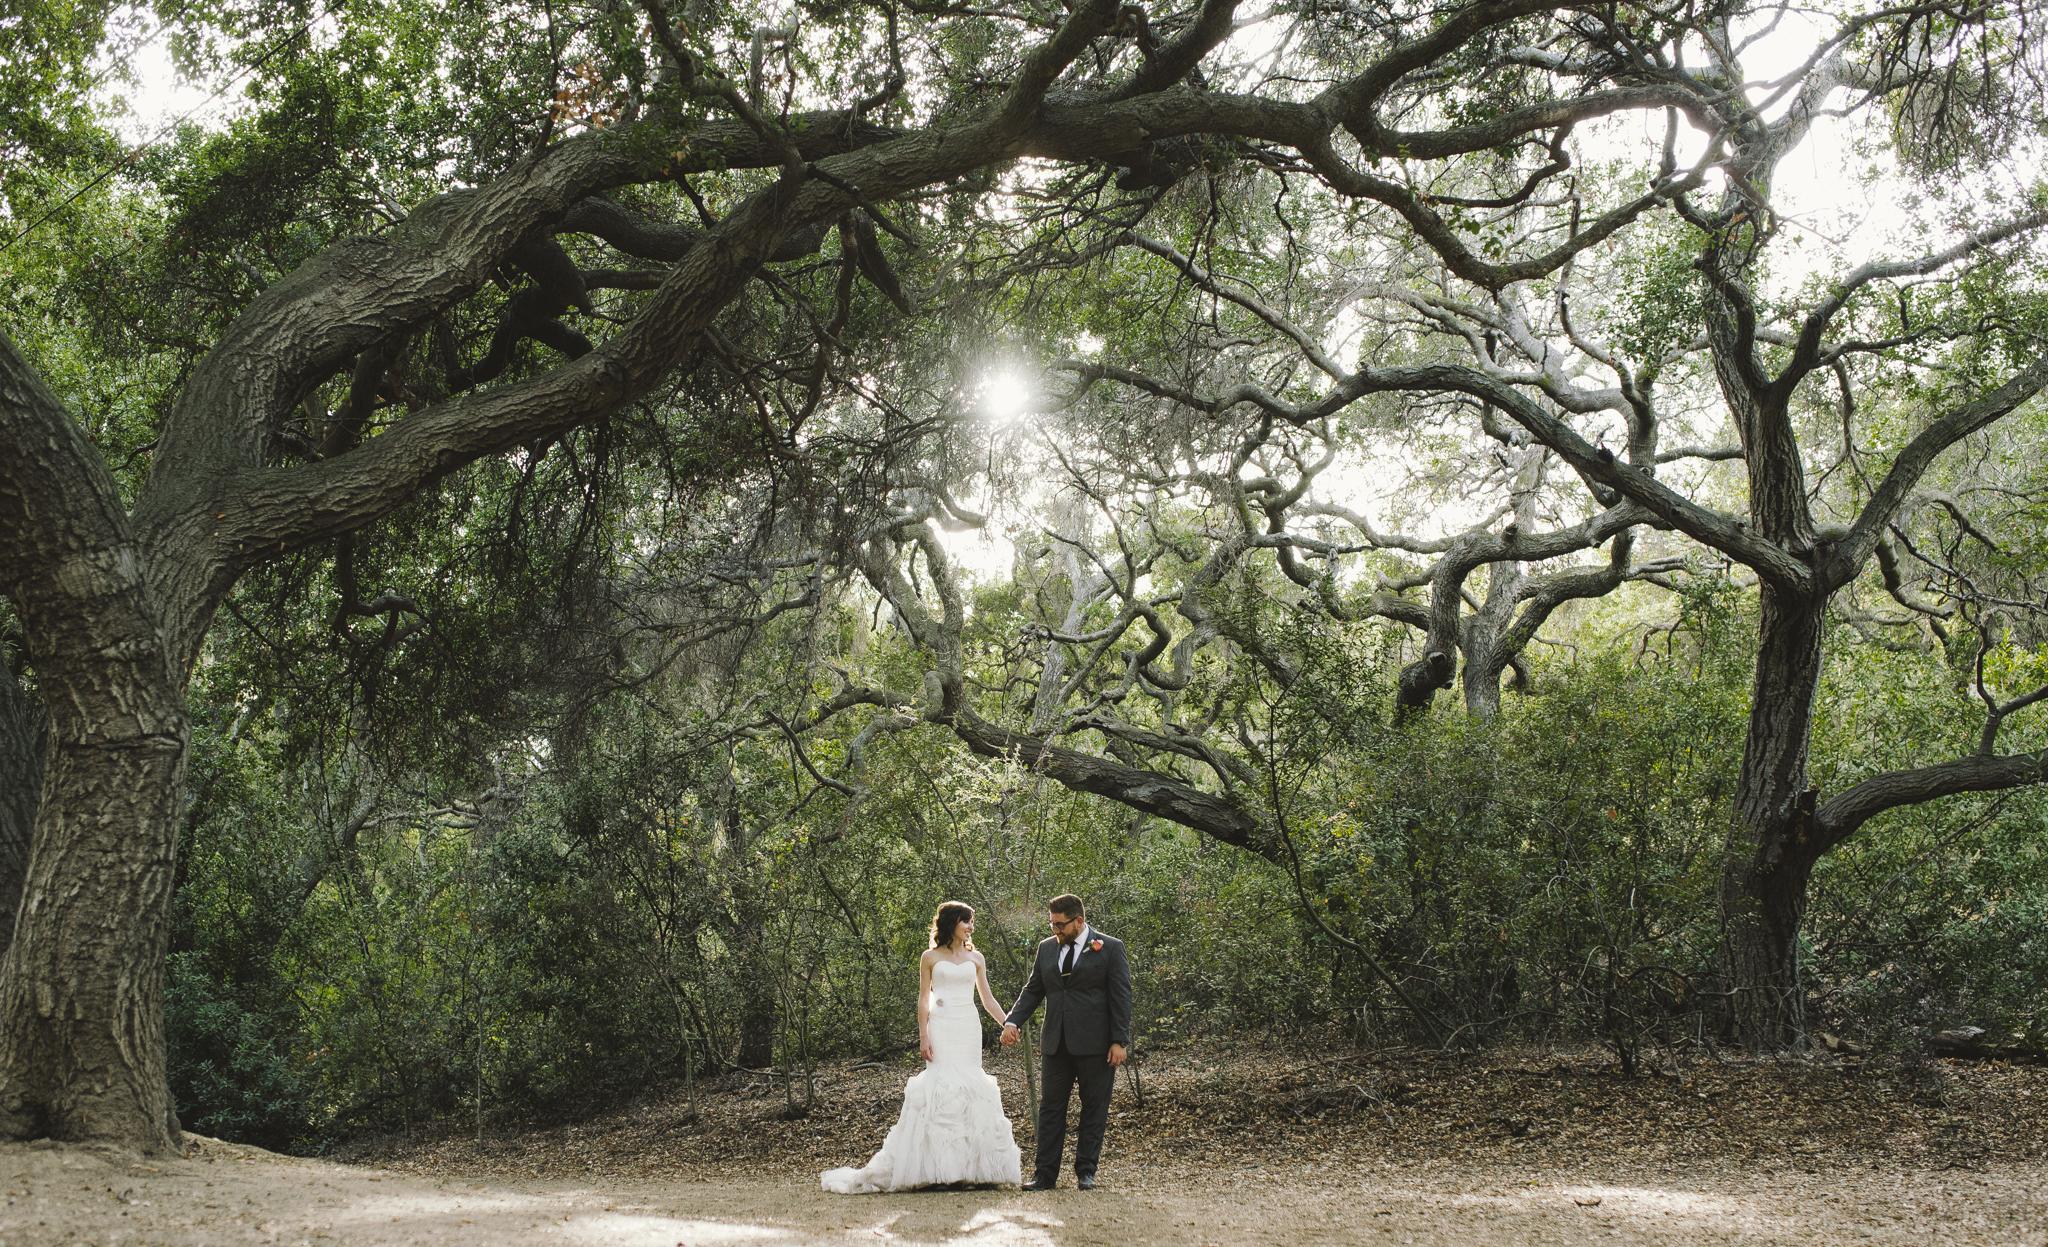 Isaiah & Taylor Photography - Los Angeles Lifestyle Wedding Photographer-25.jpg